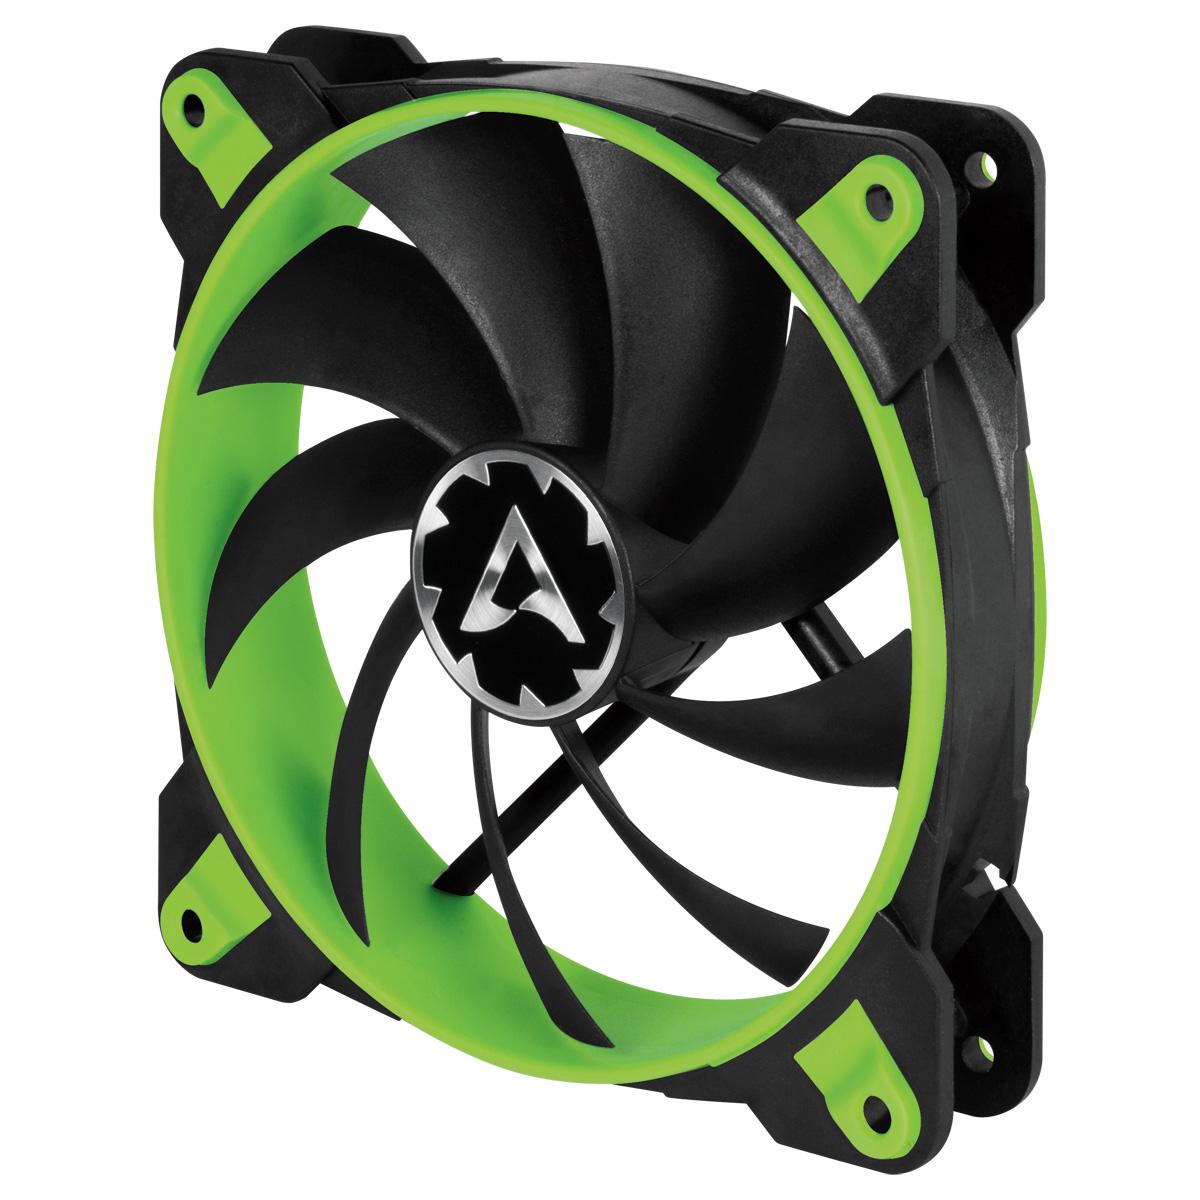 ARCTIC BioniX F120 (Green) – 120mm eSport fan